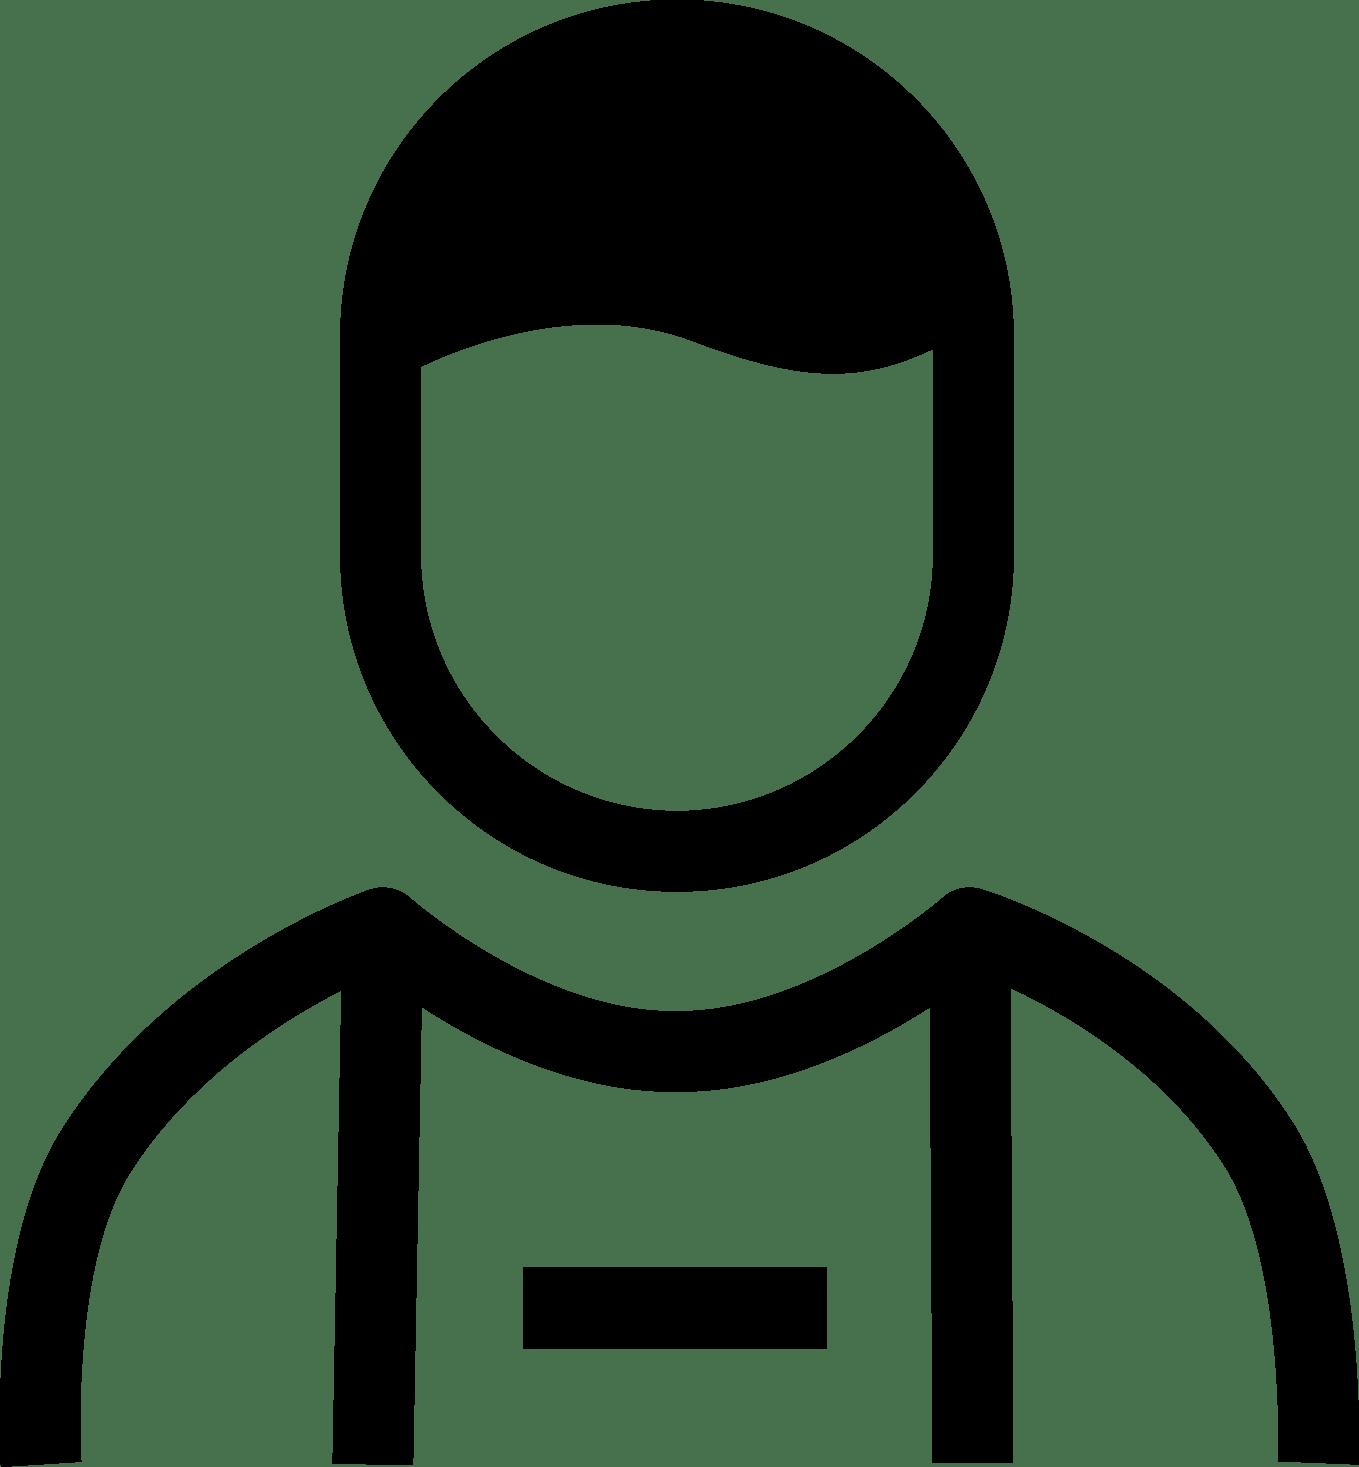 office-boy-icon